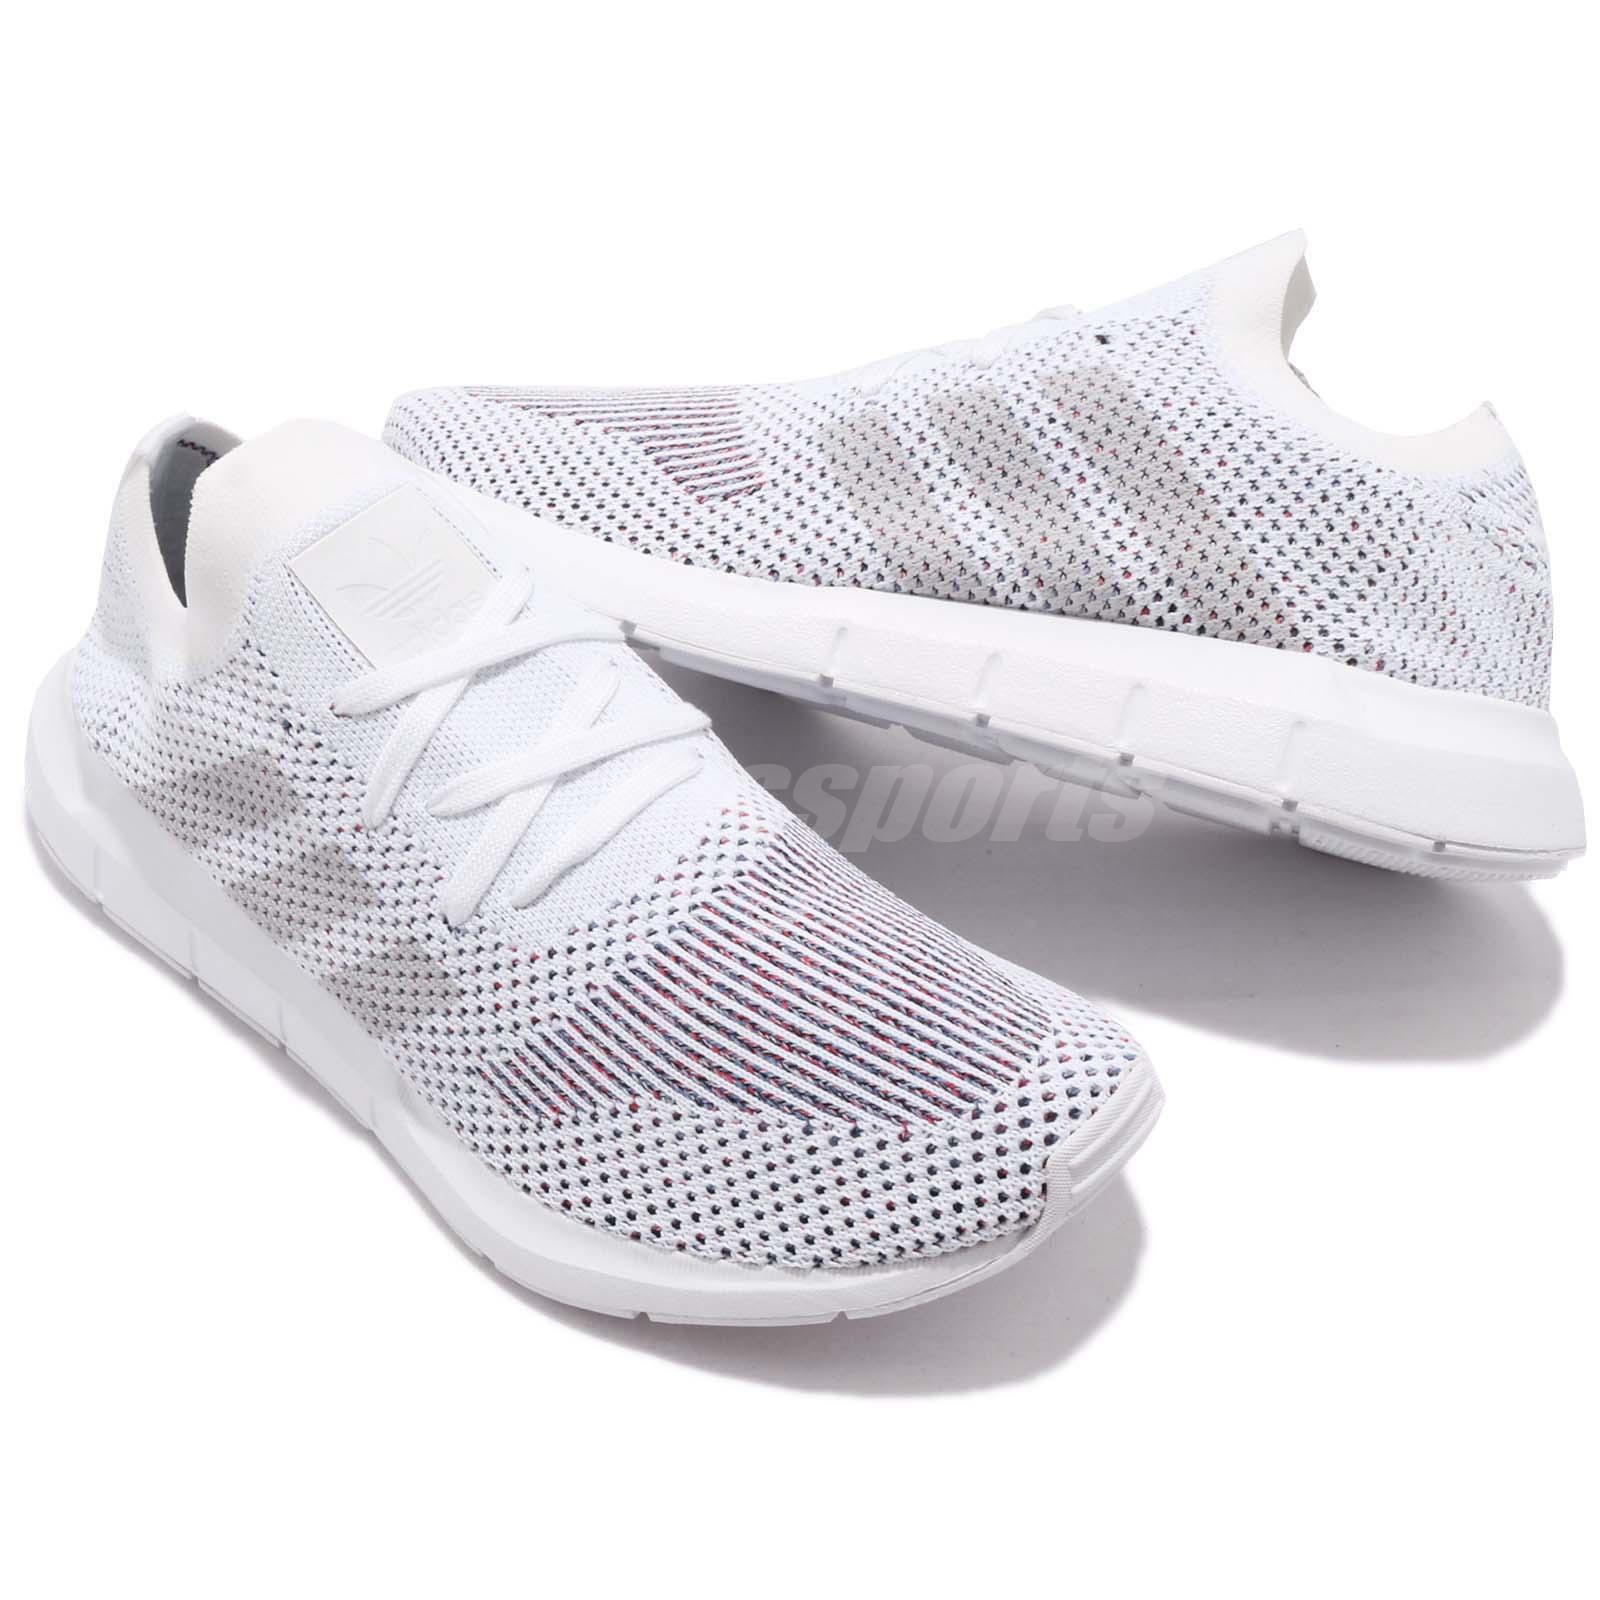 new arrival 00c01 f8d8c adidas Originals Swift Run PK Primeknit Cloud White Grey Men Running ...